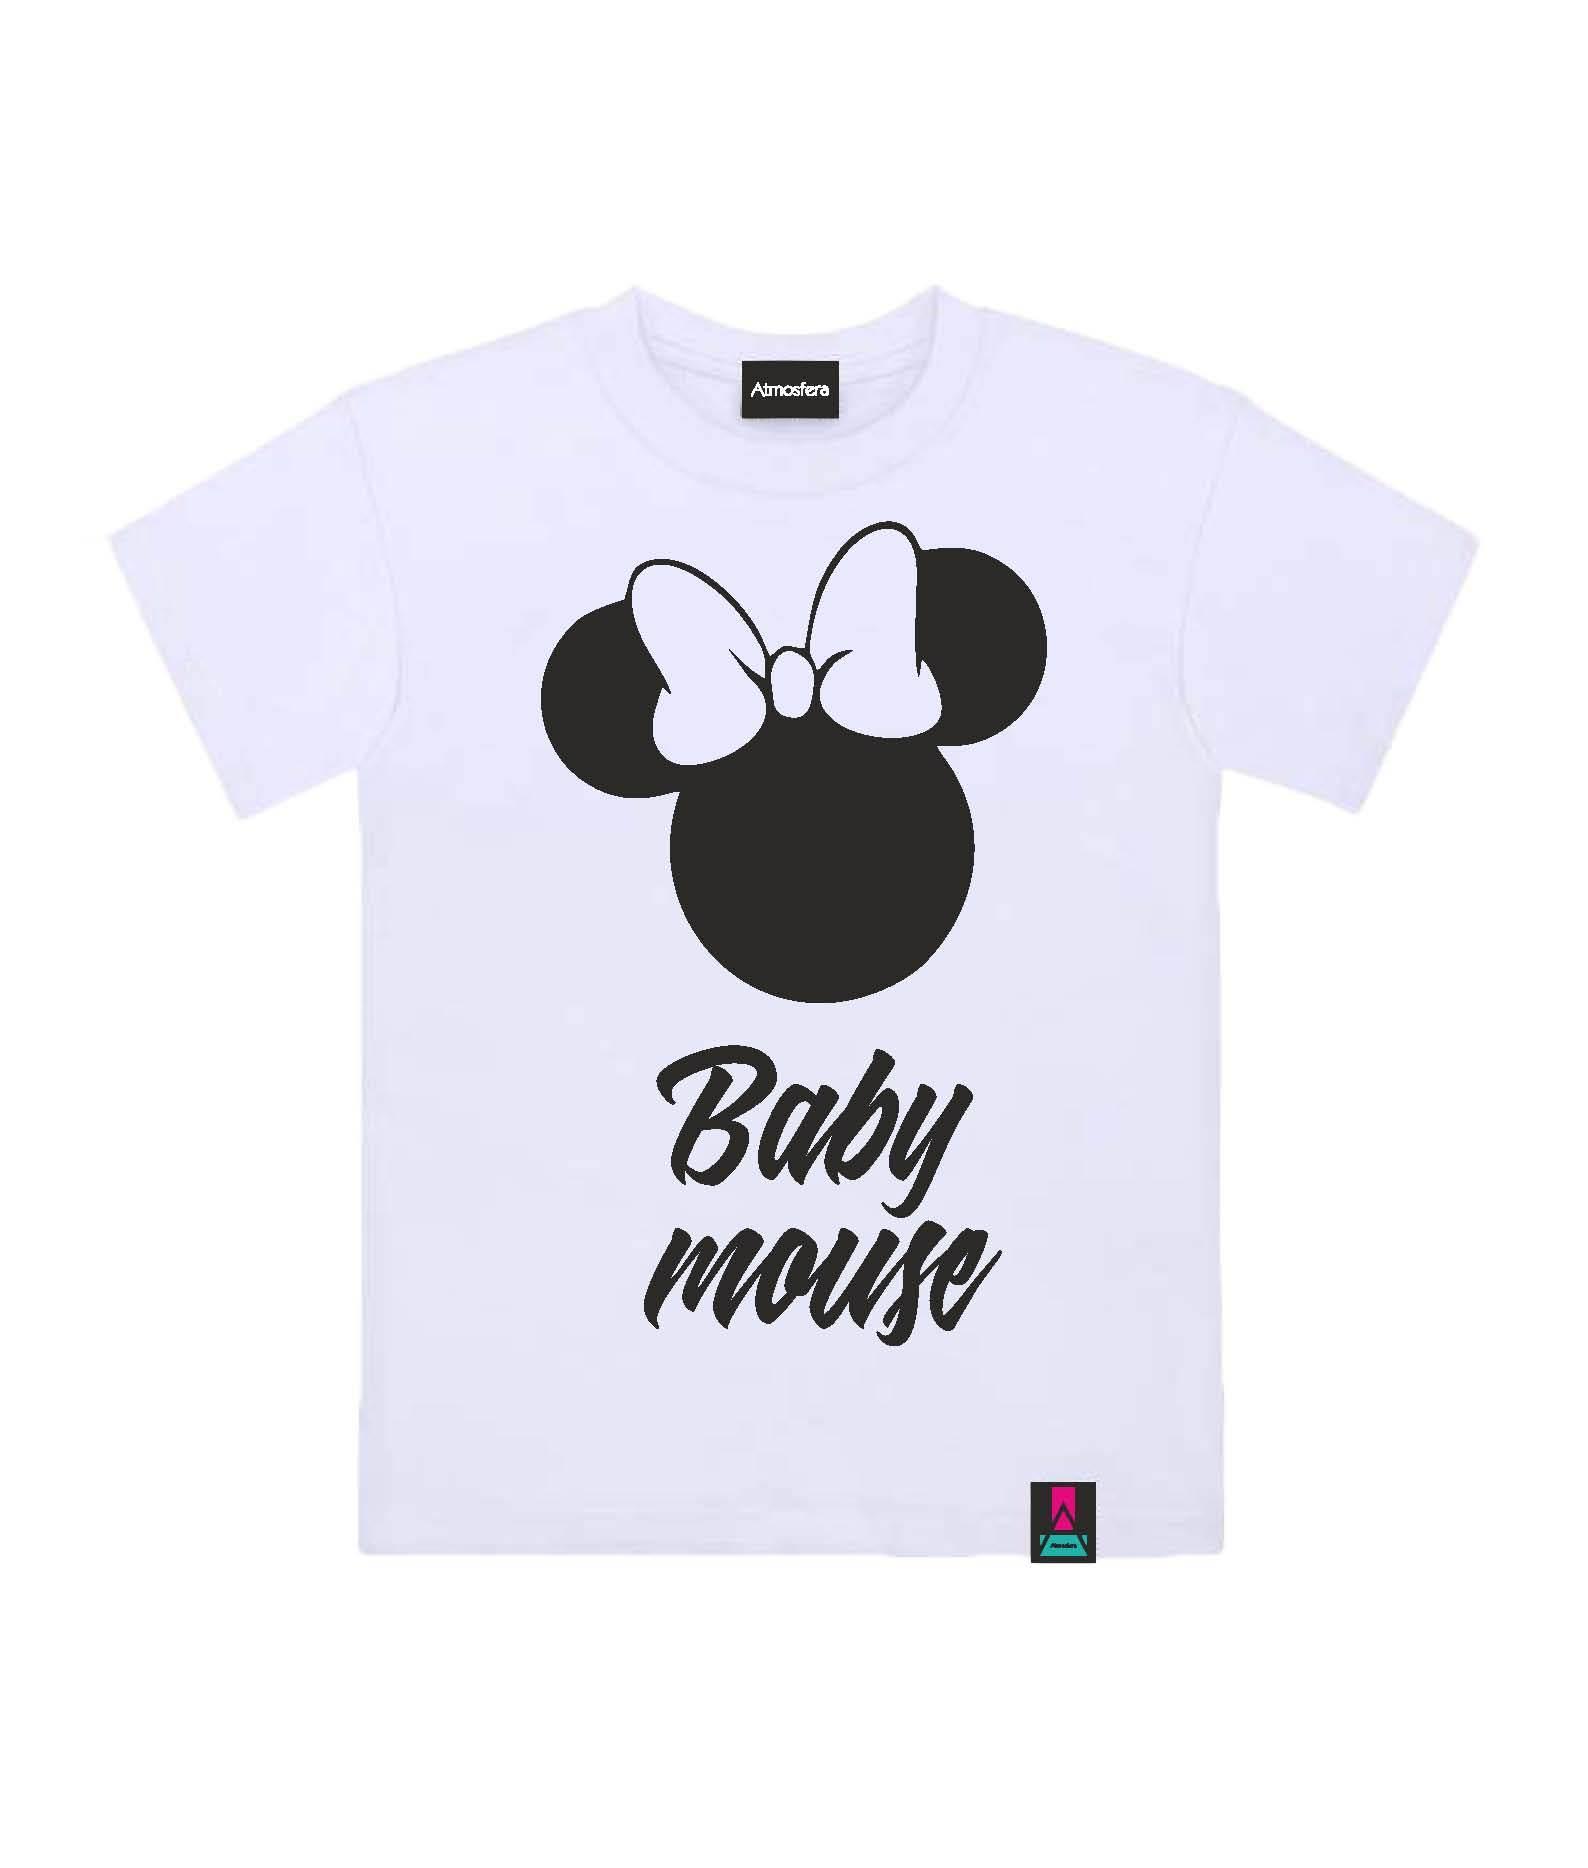 ed328824b0f6e Детские футболки с надписями и принтами - Атмосфера Магазин Футболок